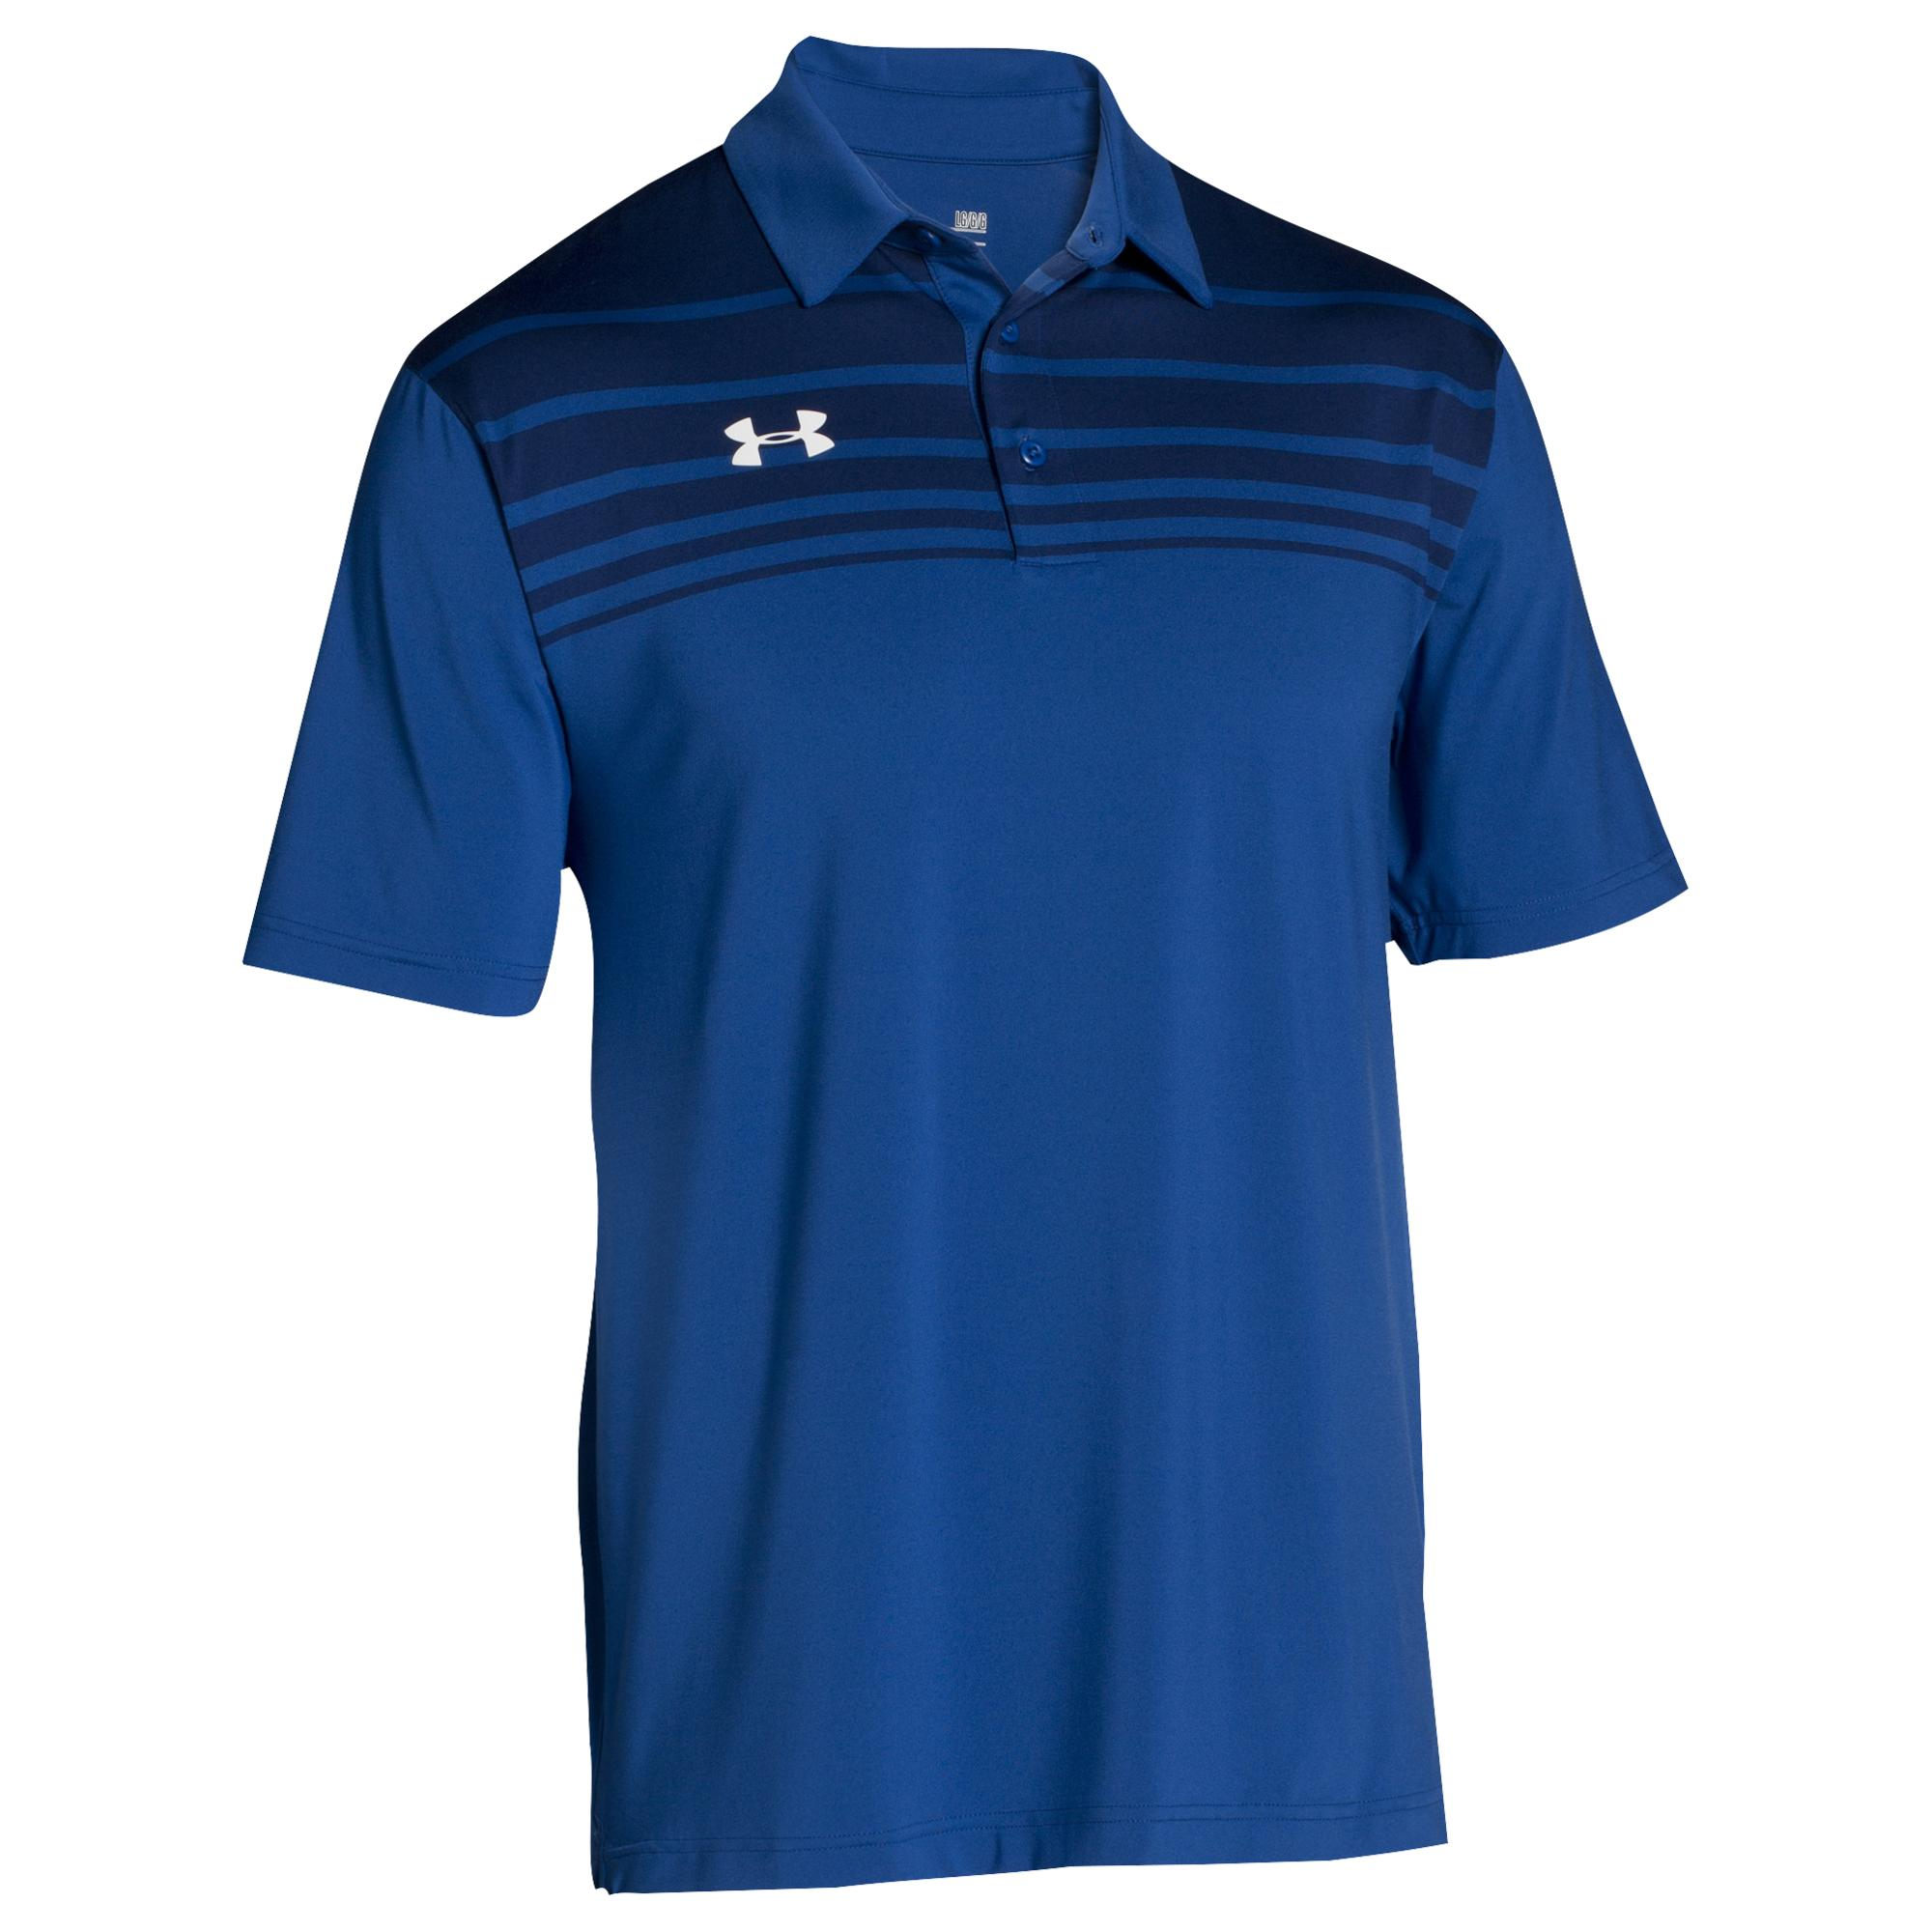 ed836f05a9 Men's Blue Victor Polo Shirt Ua Short Sleeve Golf Shirts (royal